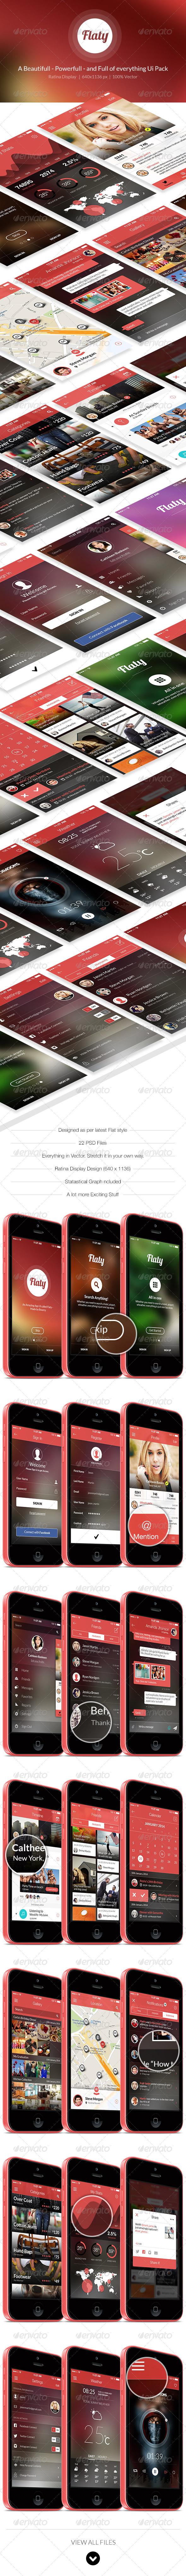 GraphicRiver Flaty A Beautiful Set of Mobile UI 7278673